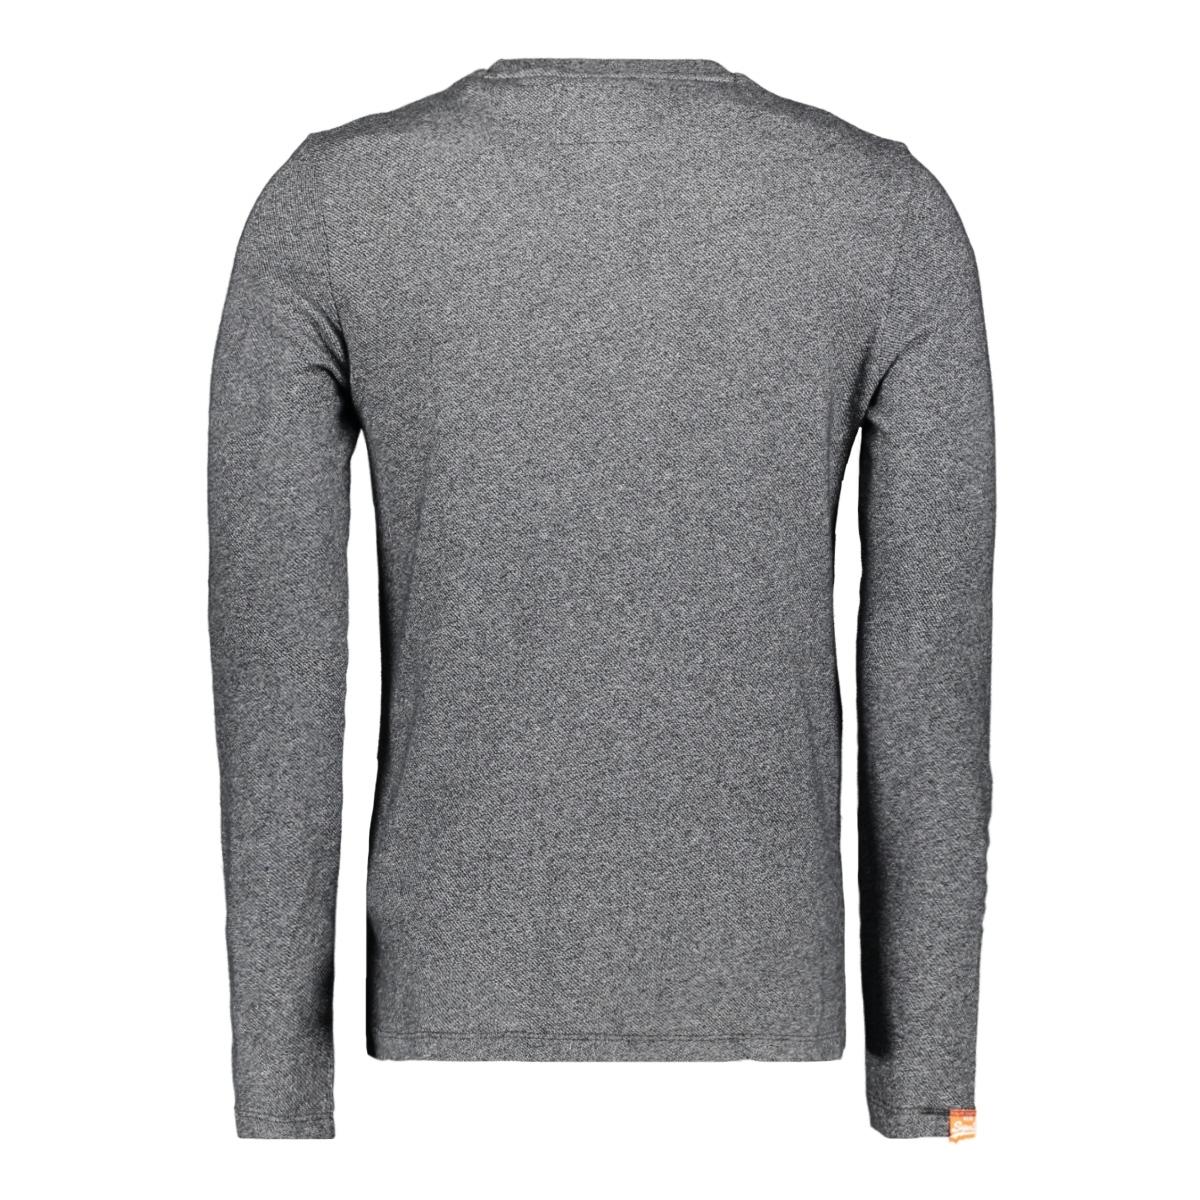 twill texture ls top m6000011a superdry t-shirt basalt grey twill